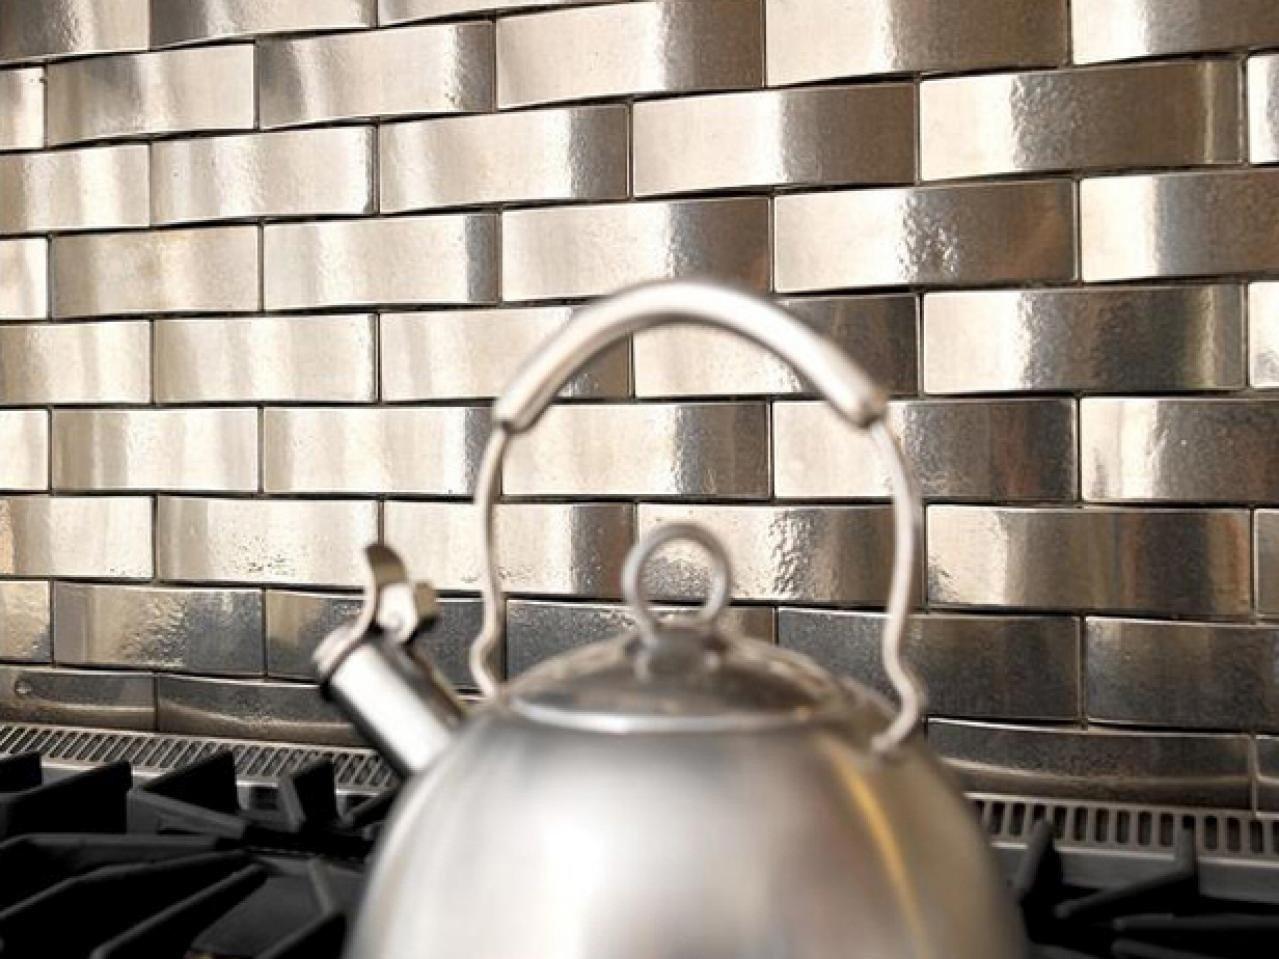 Metallic pattern kitchen backsplash